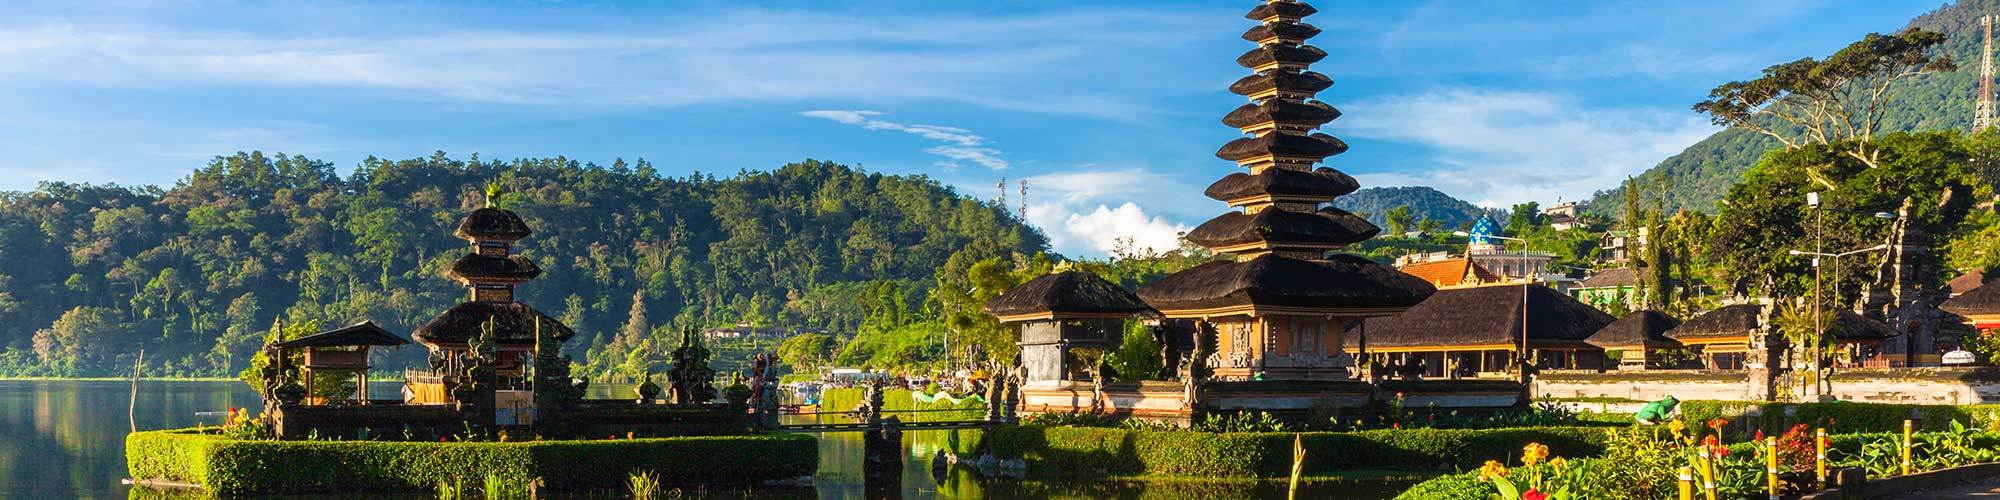 Pura Ulun Danu Bratan, Bali, Indonesia - El Pais Viajes